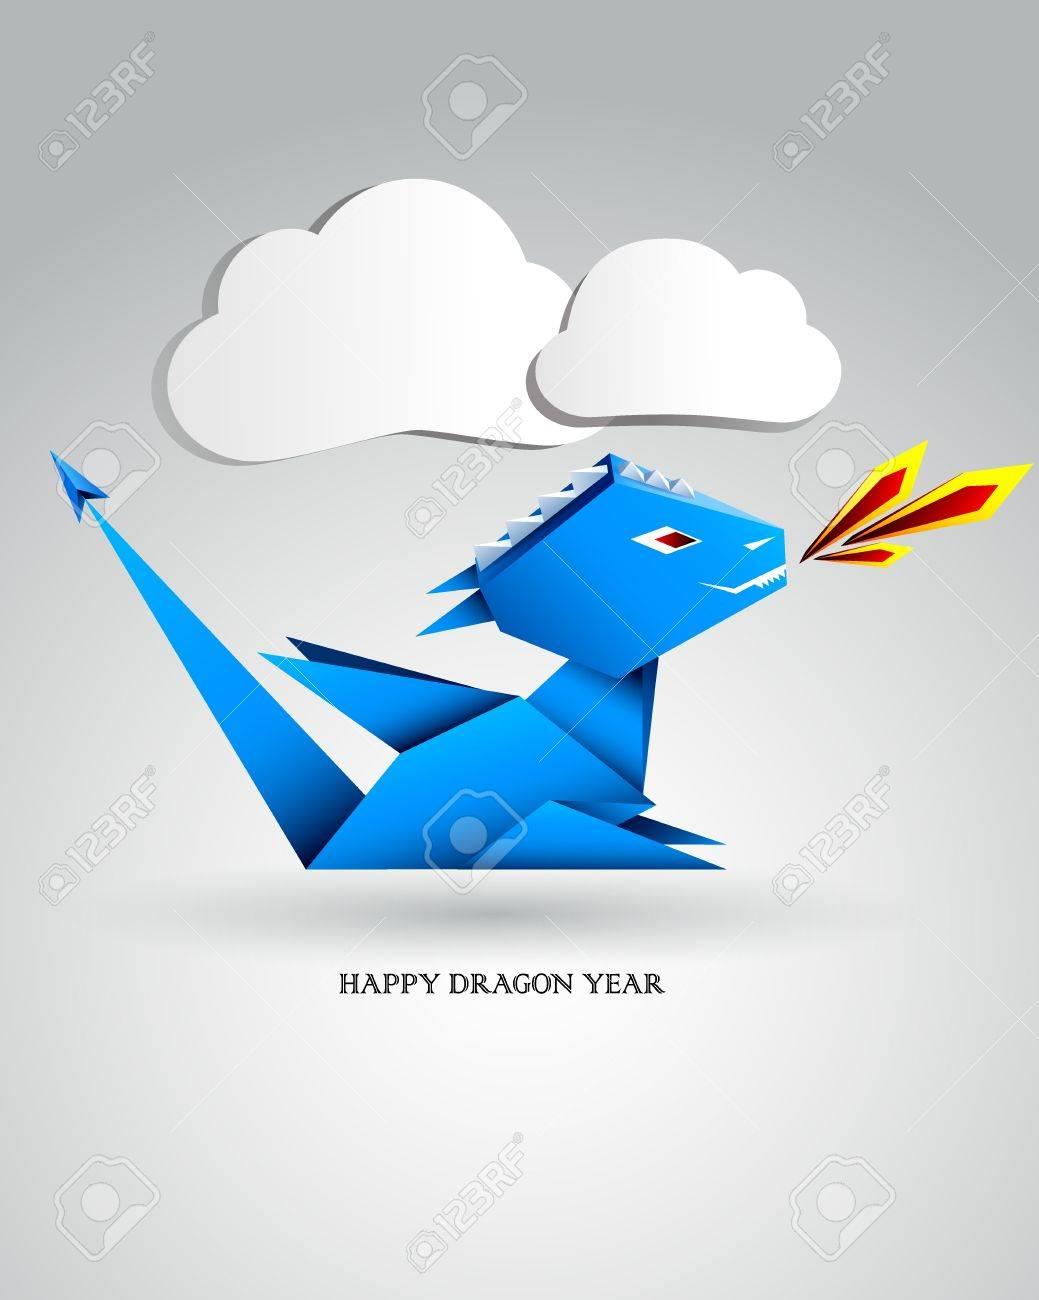 Little Origami Dragon - 11432795